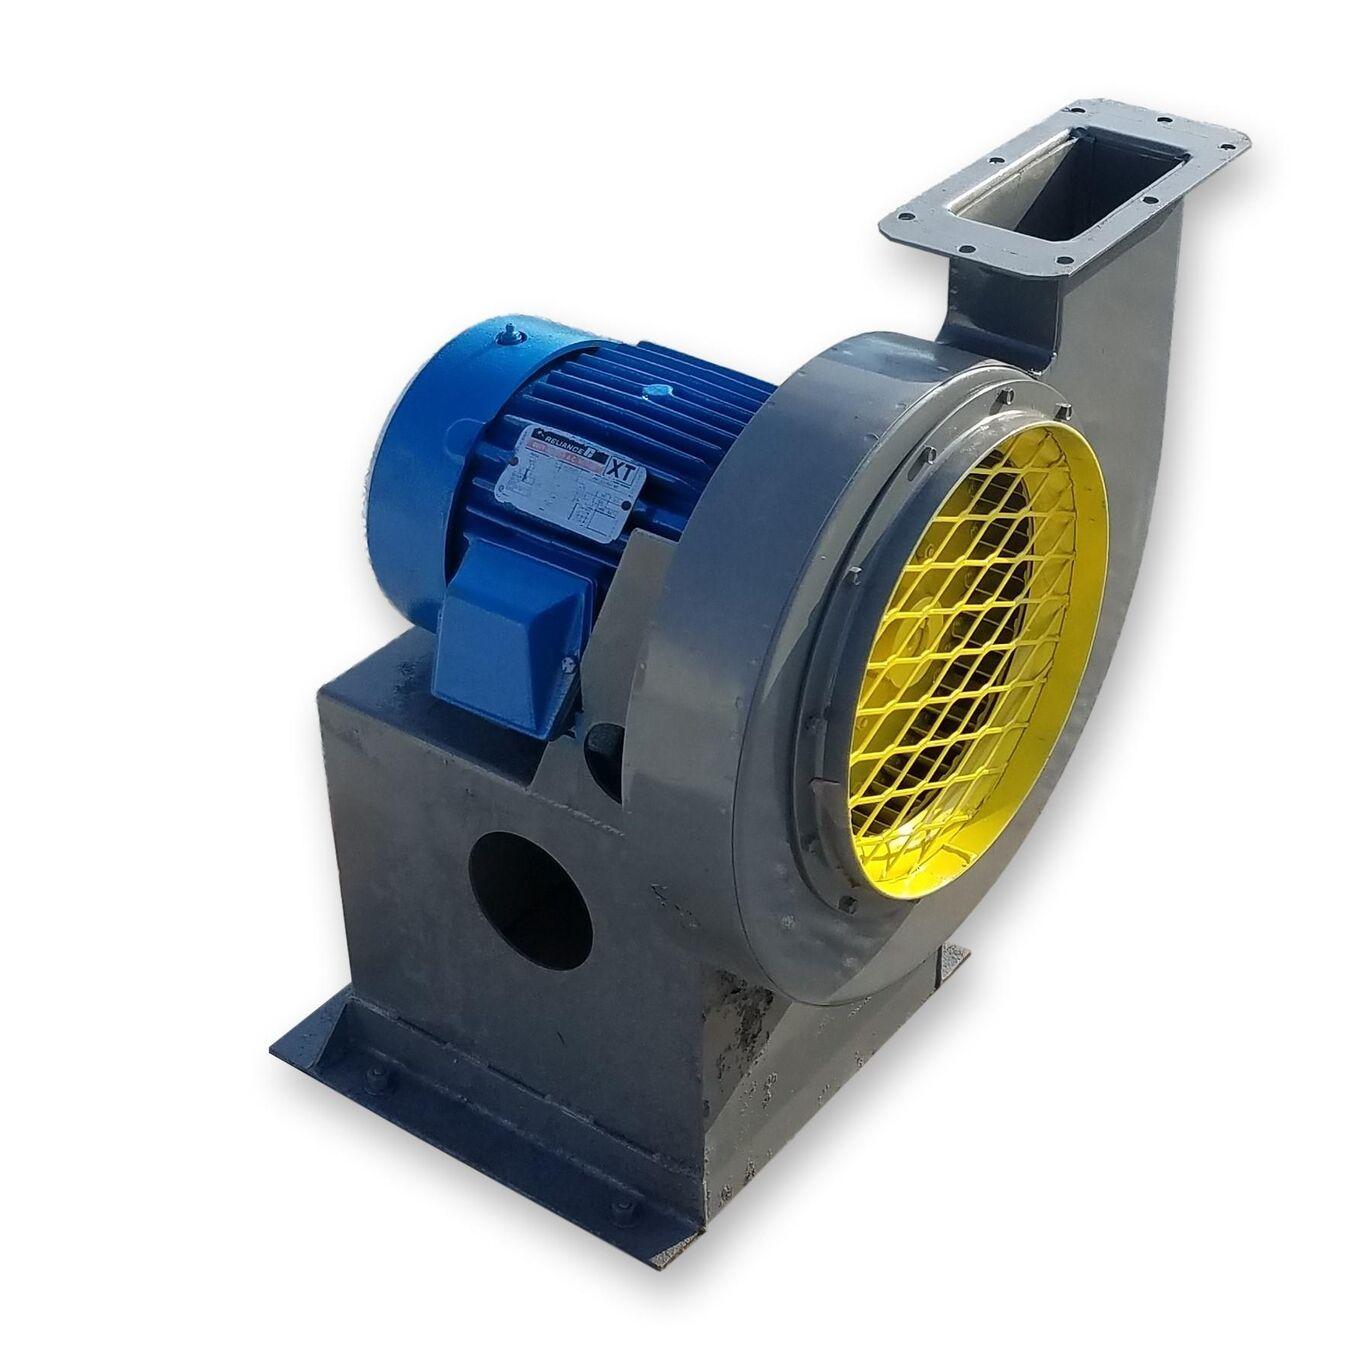 1000 Cfm Ventilation Fan : Cfm quot sp used hp quickdraft fan fans blowers